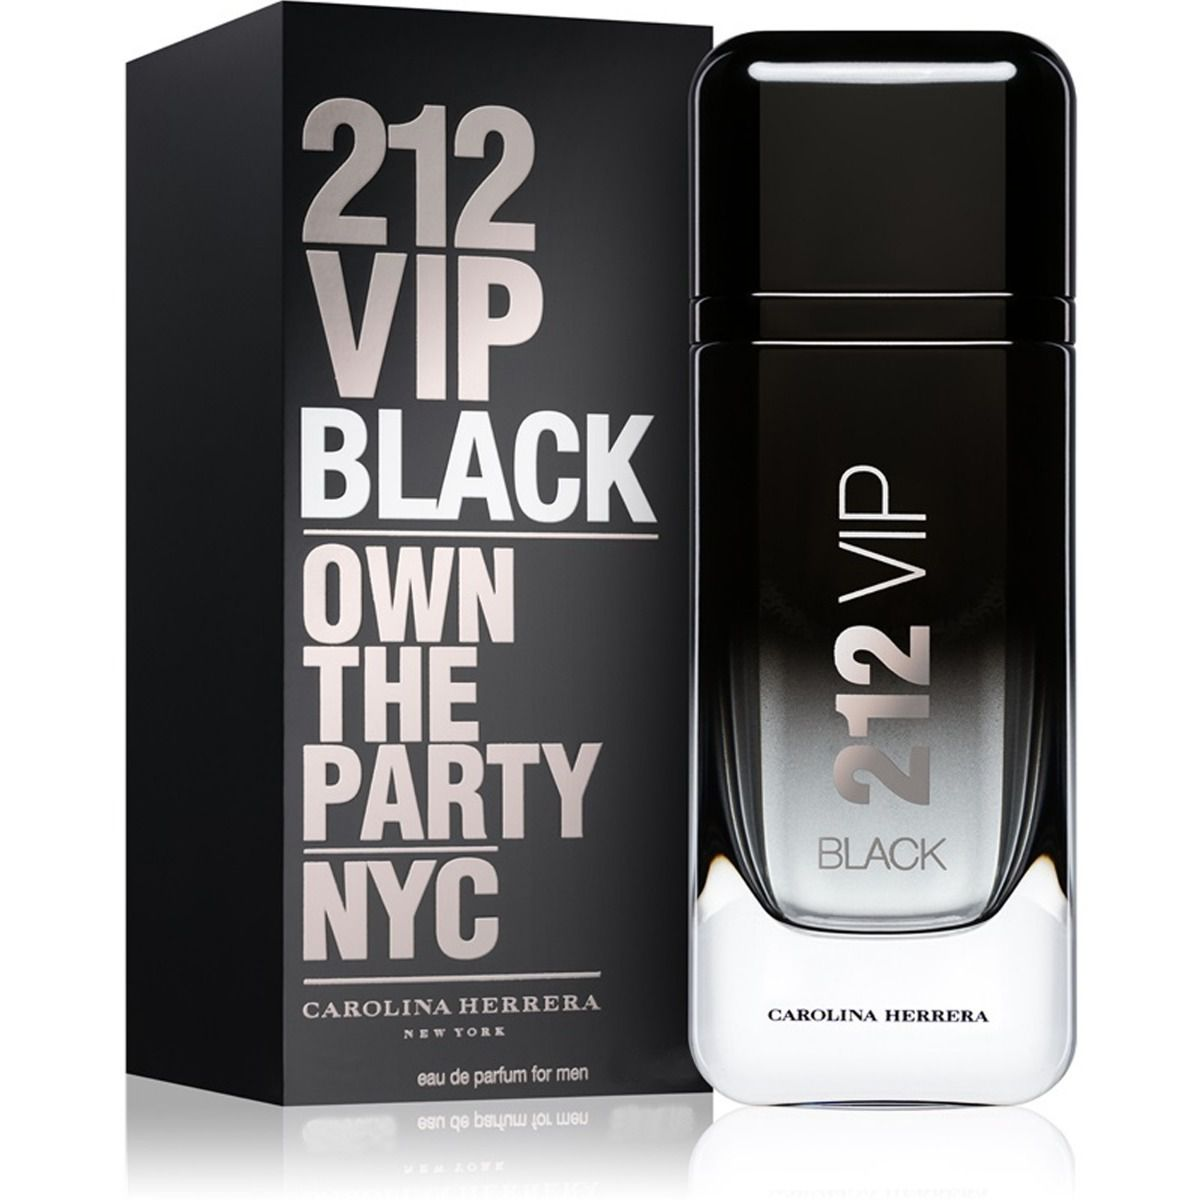 e8b8fb0061 Perfume Masculino Carolina Herrera 212 VIP Black Eau de Parfum ...